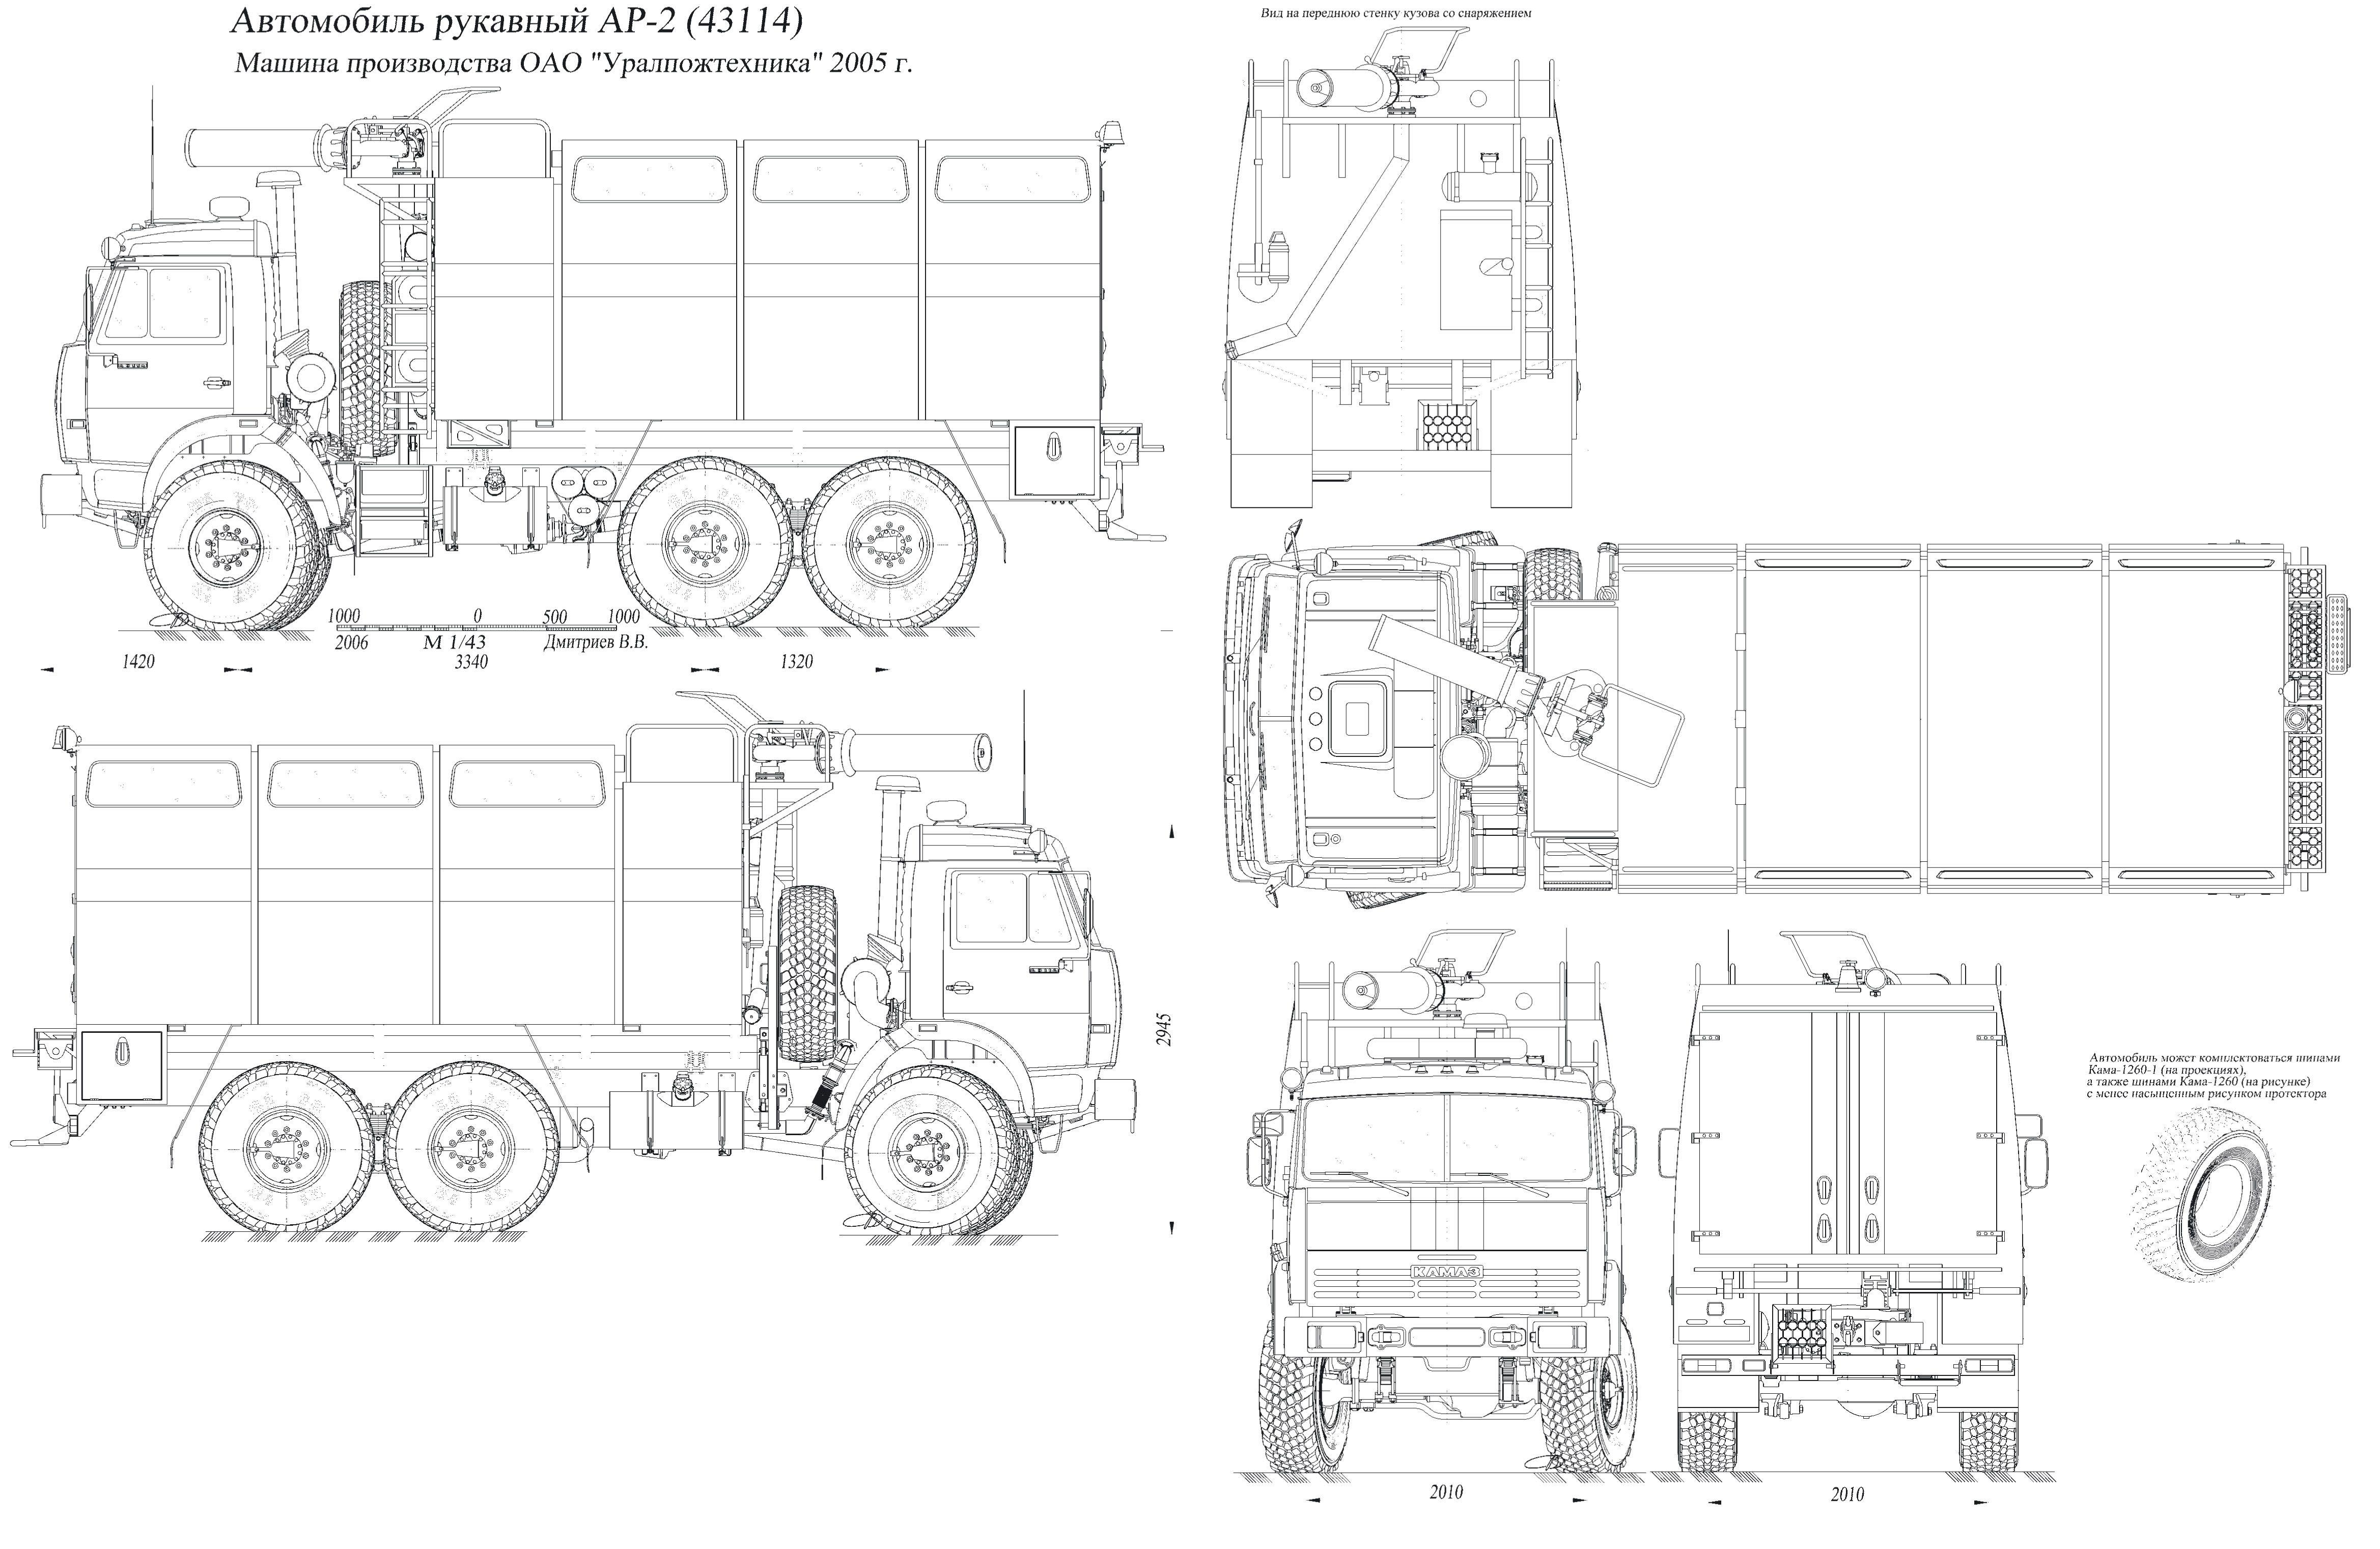 Kamaz 43114 ar 2 id 491 auto kamaz su rus 1976 for Arkansas blueprint